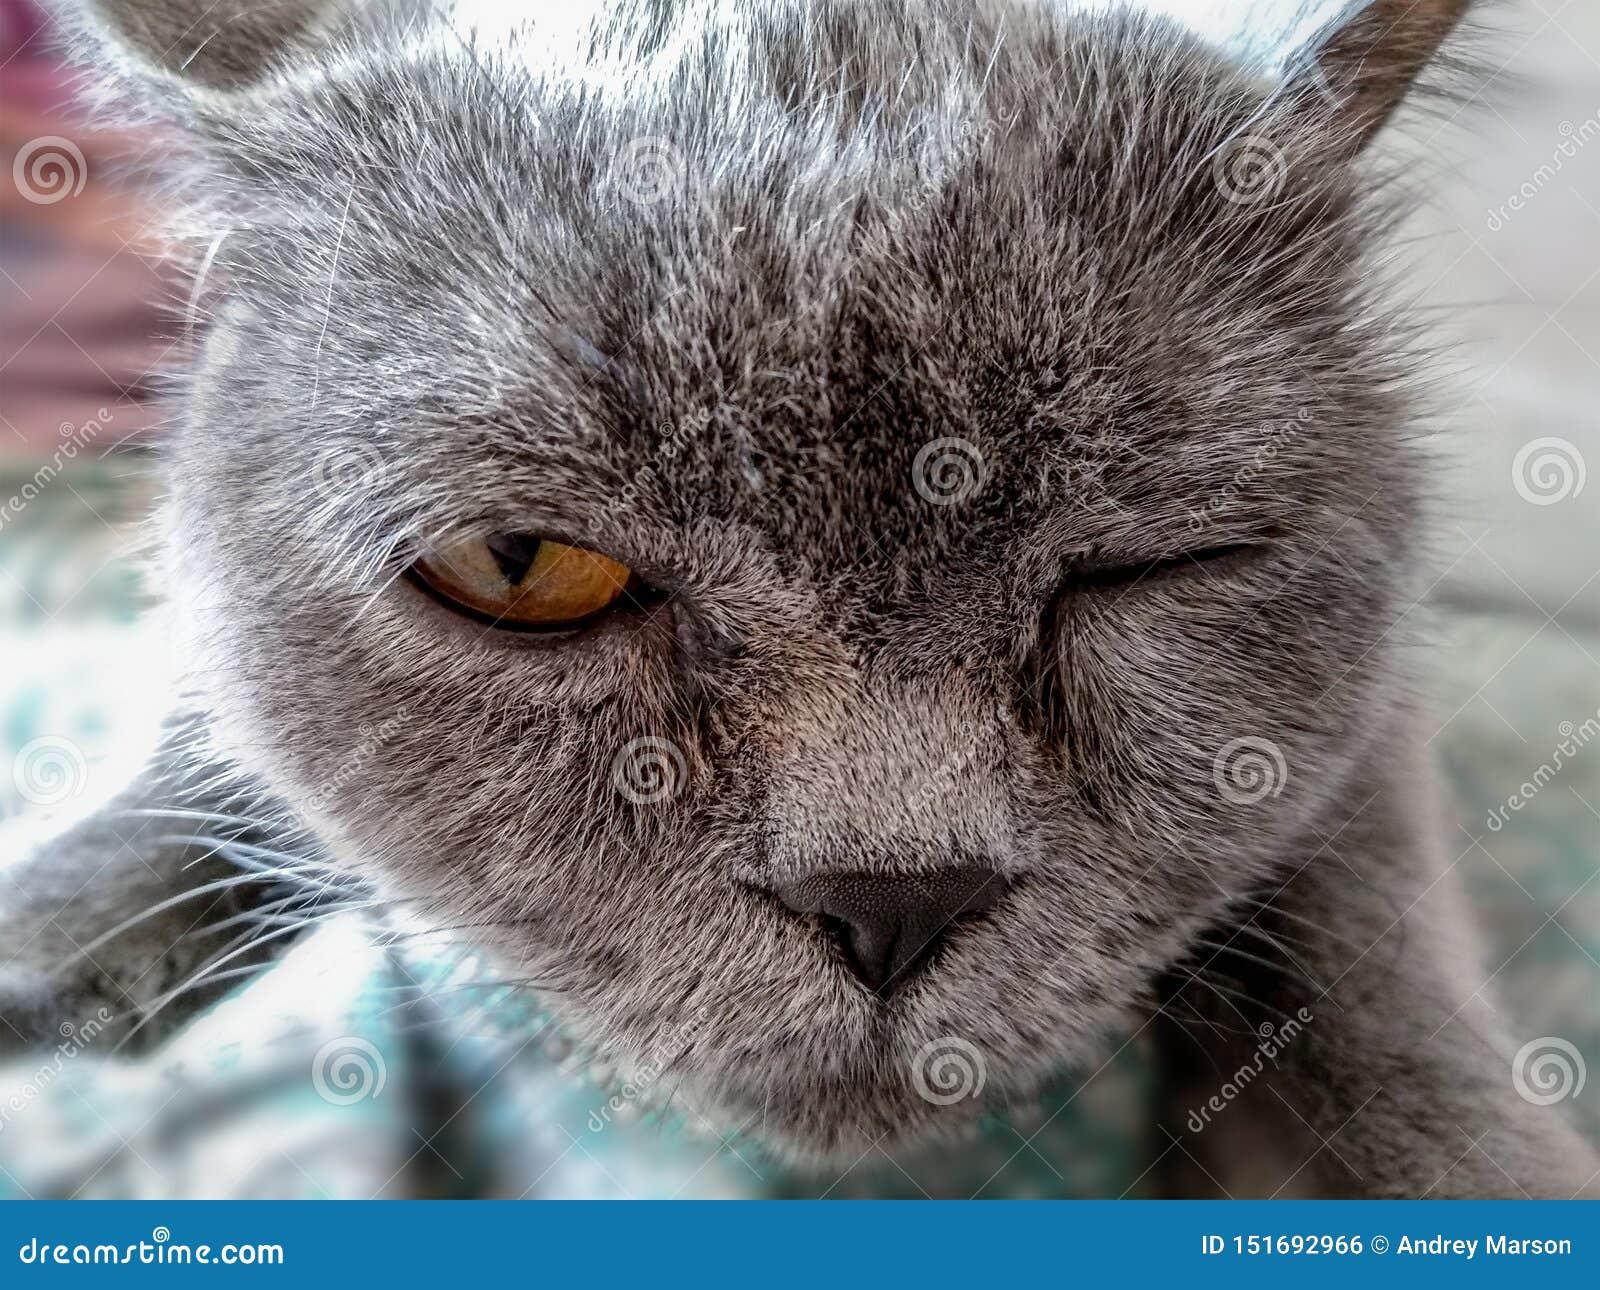 British cat that blinks with pleasure